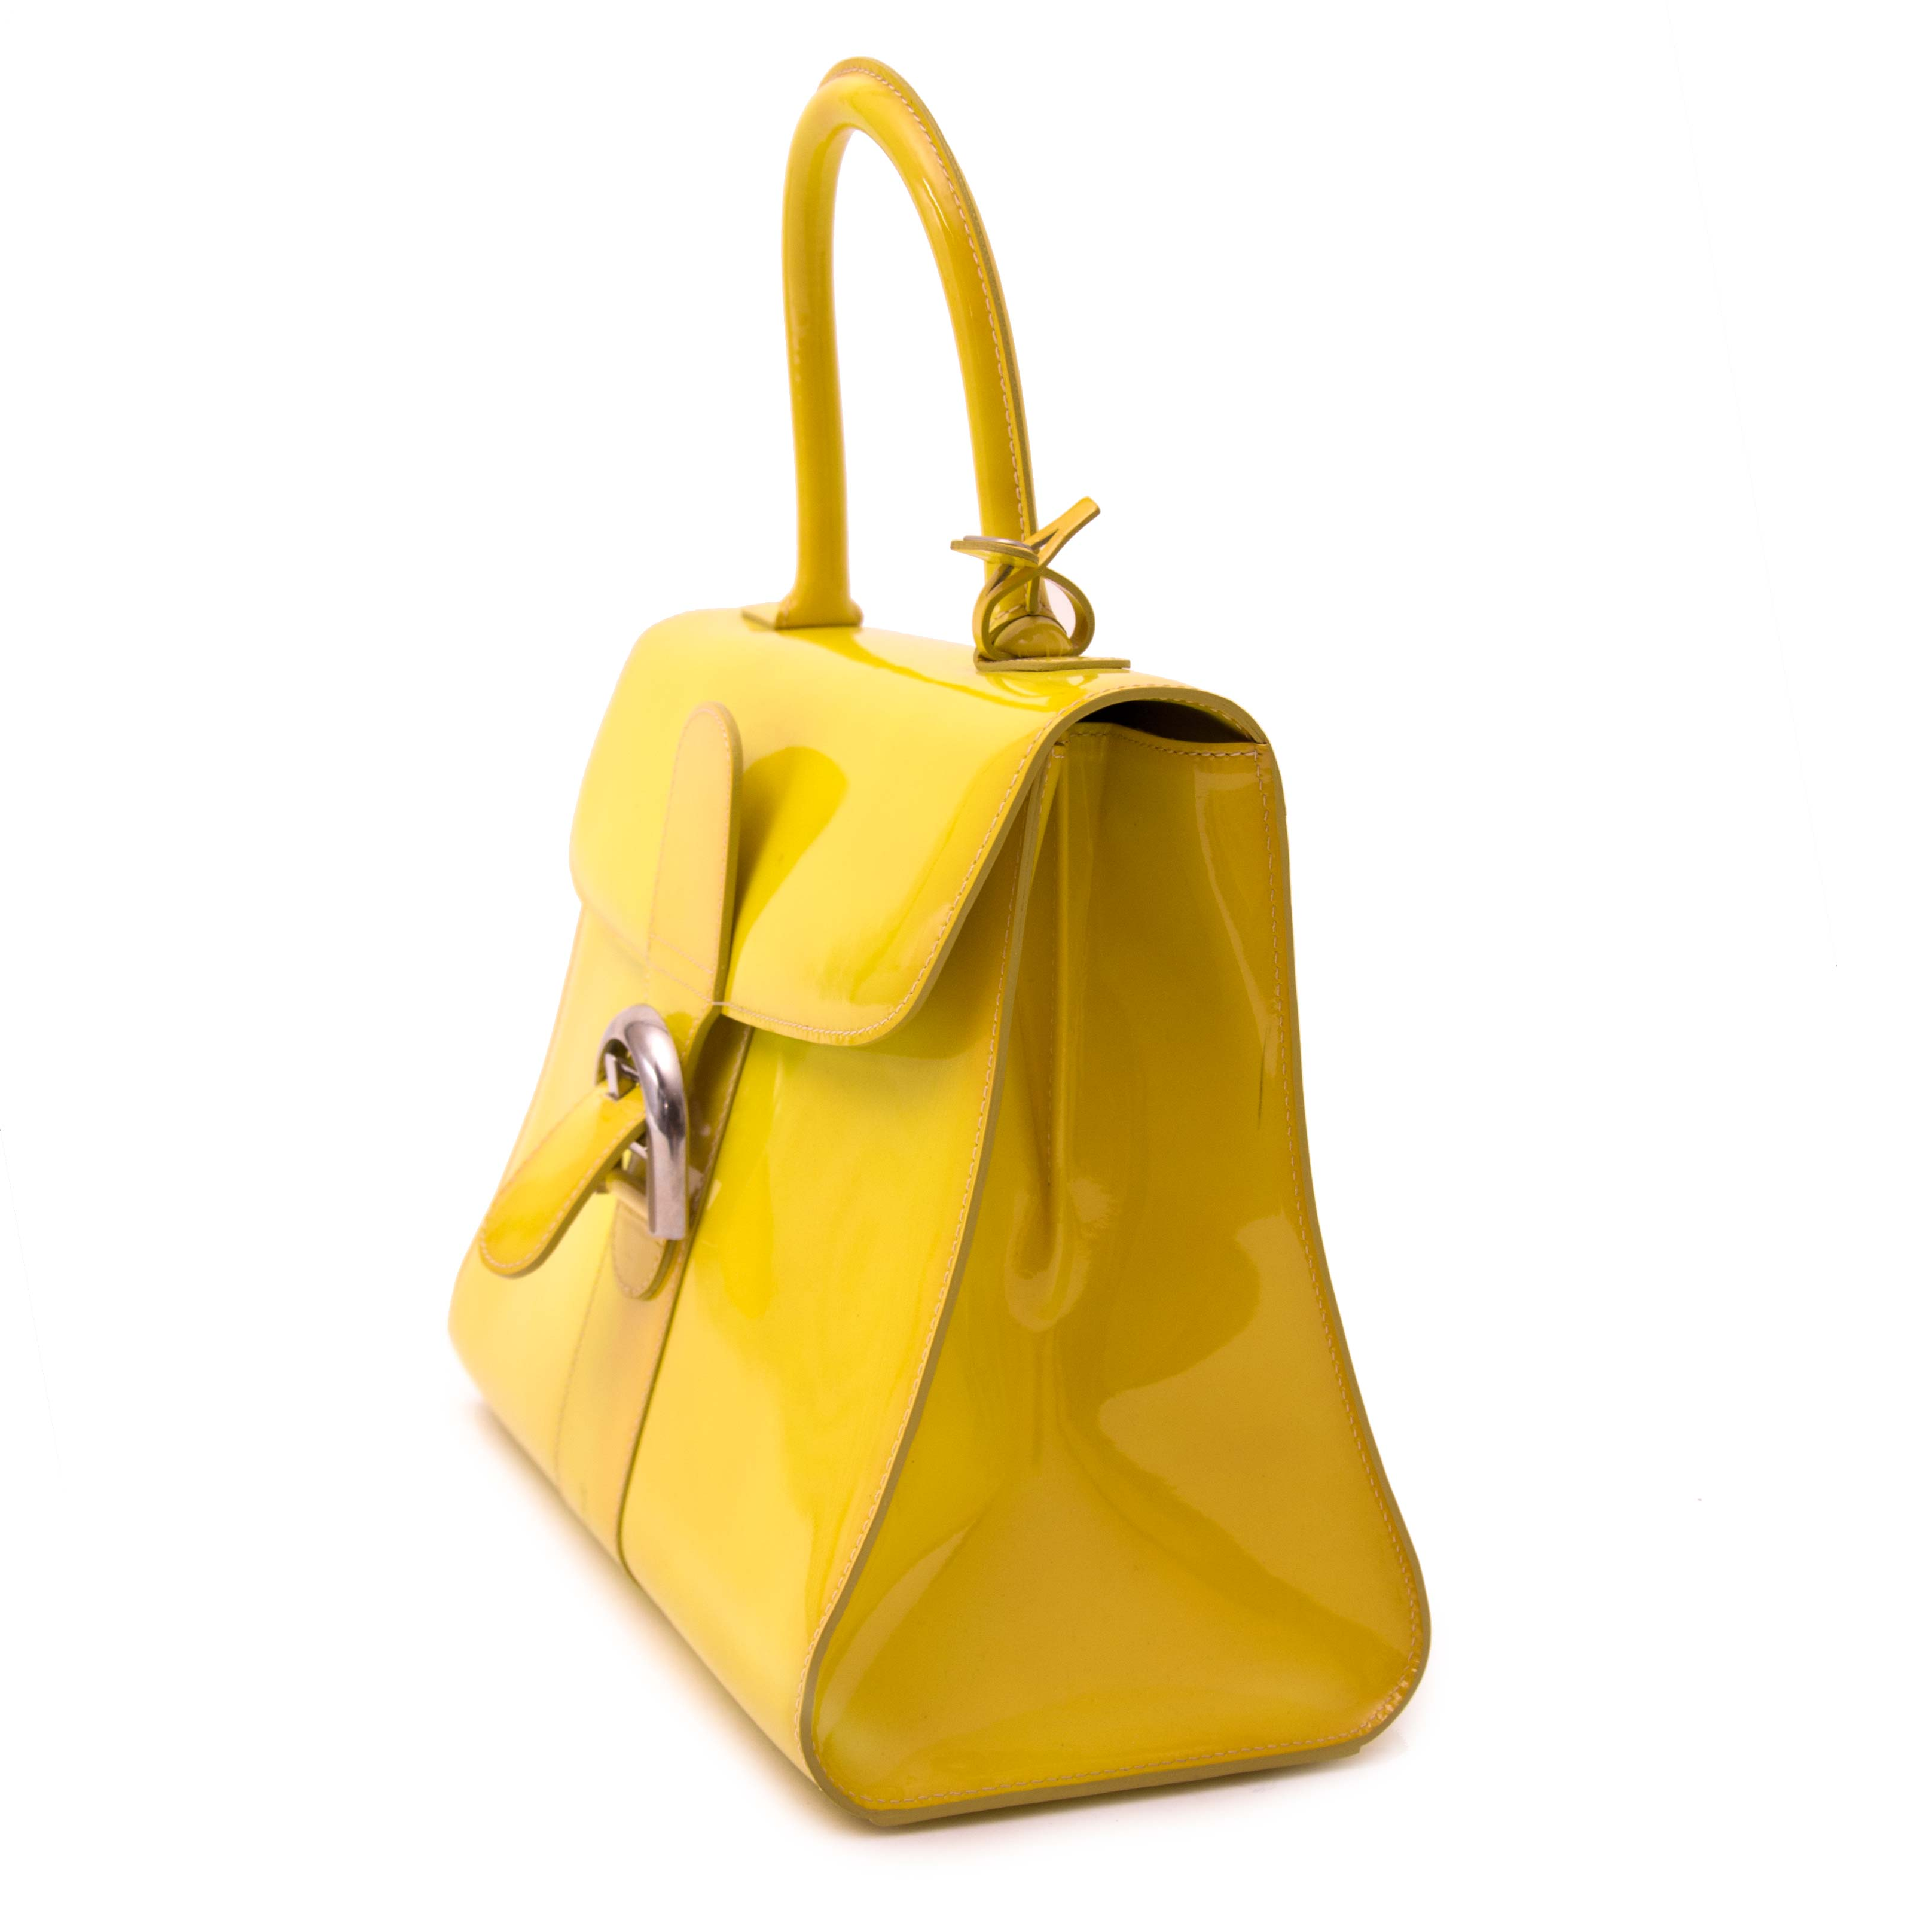 acheter en ligne seconde main Rare Delvaux Limited Patent Fluo Yellow Brillant